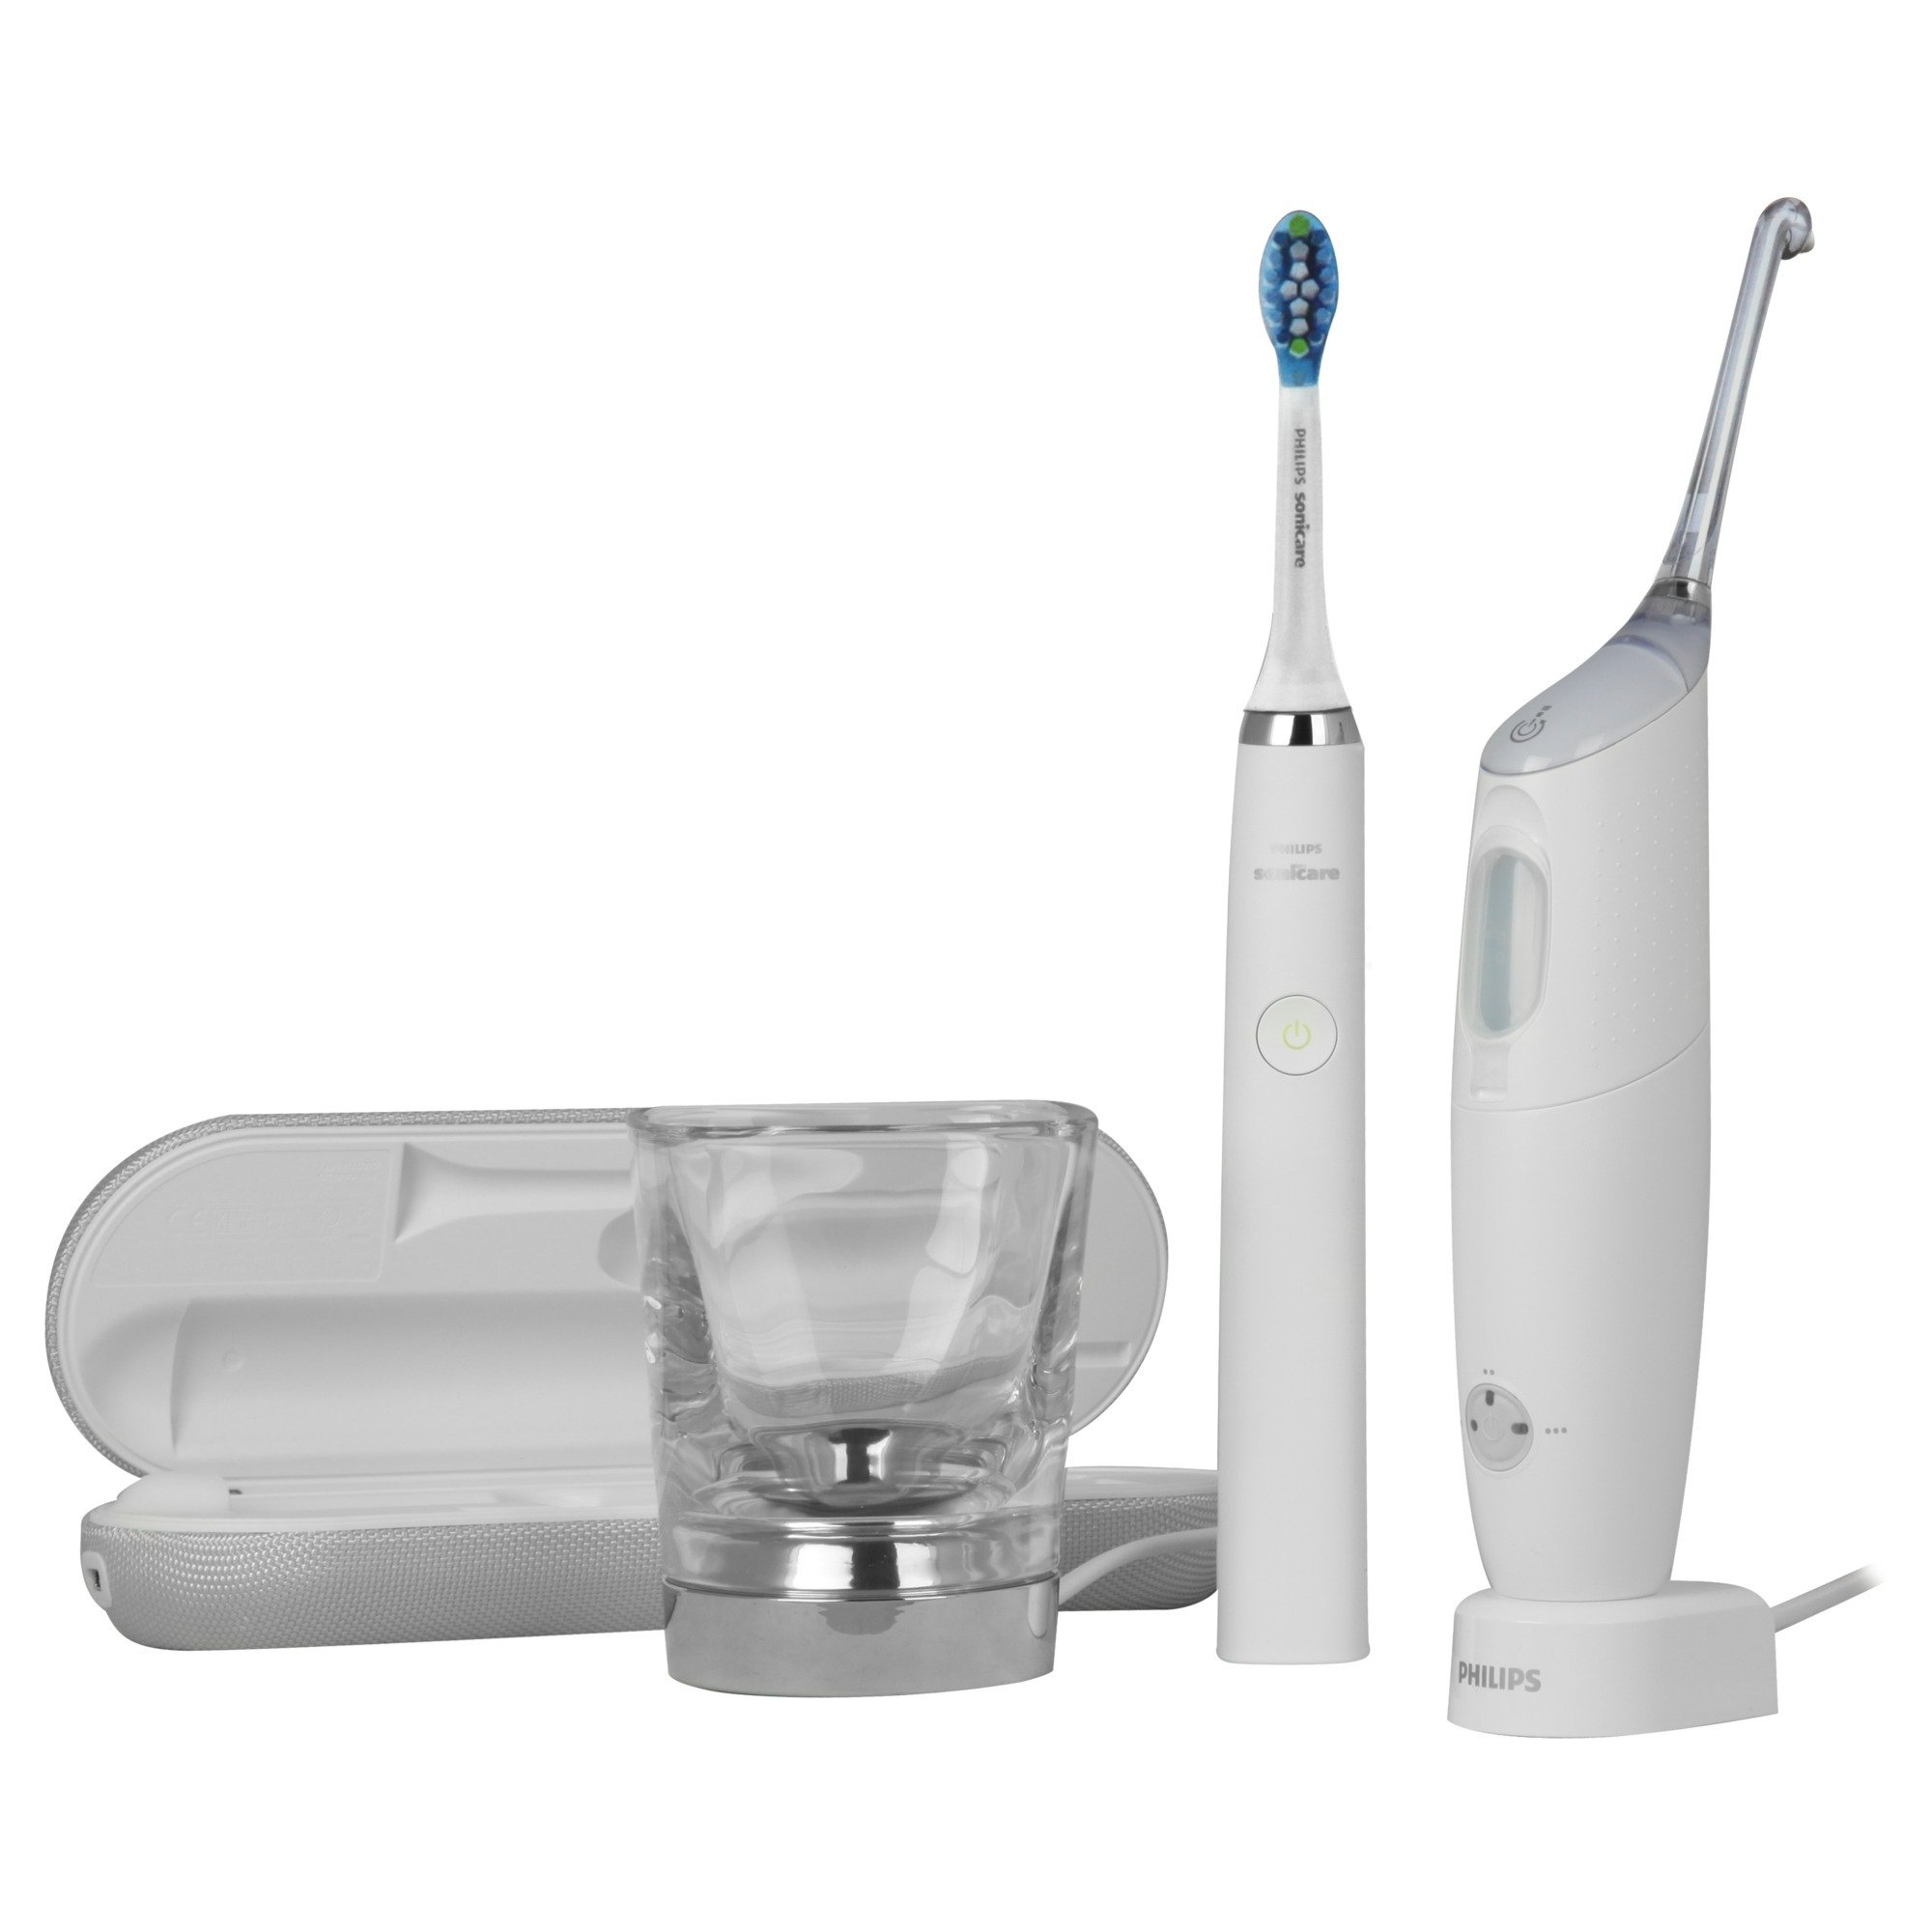 Sonicare HX8492/01 hilo dental eléctrico Blanco, Limpieza bucal